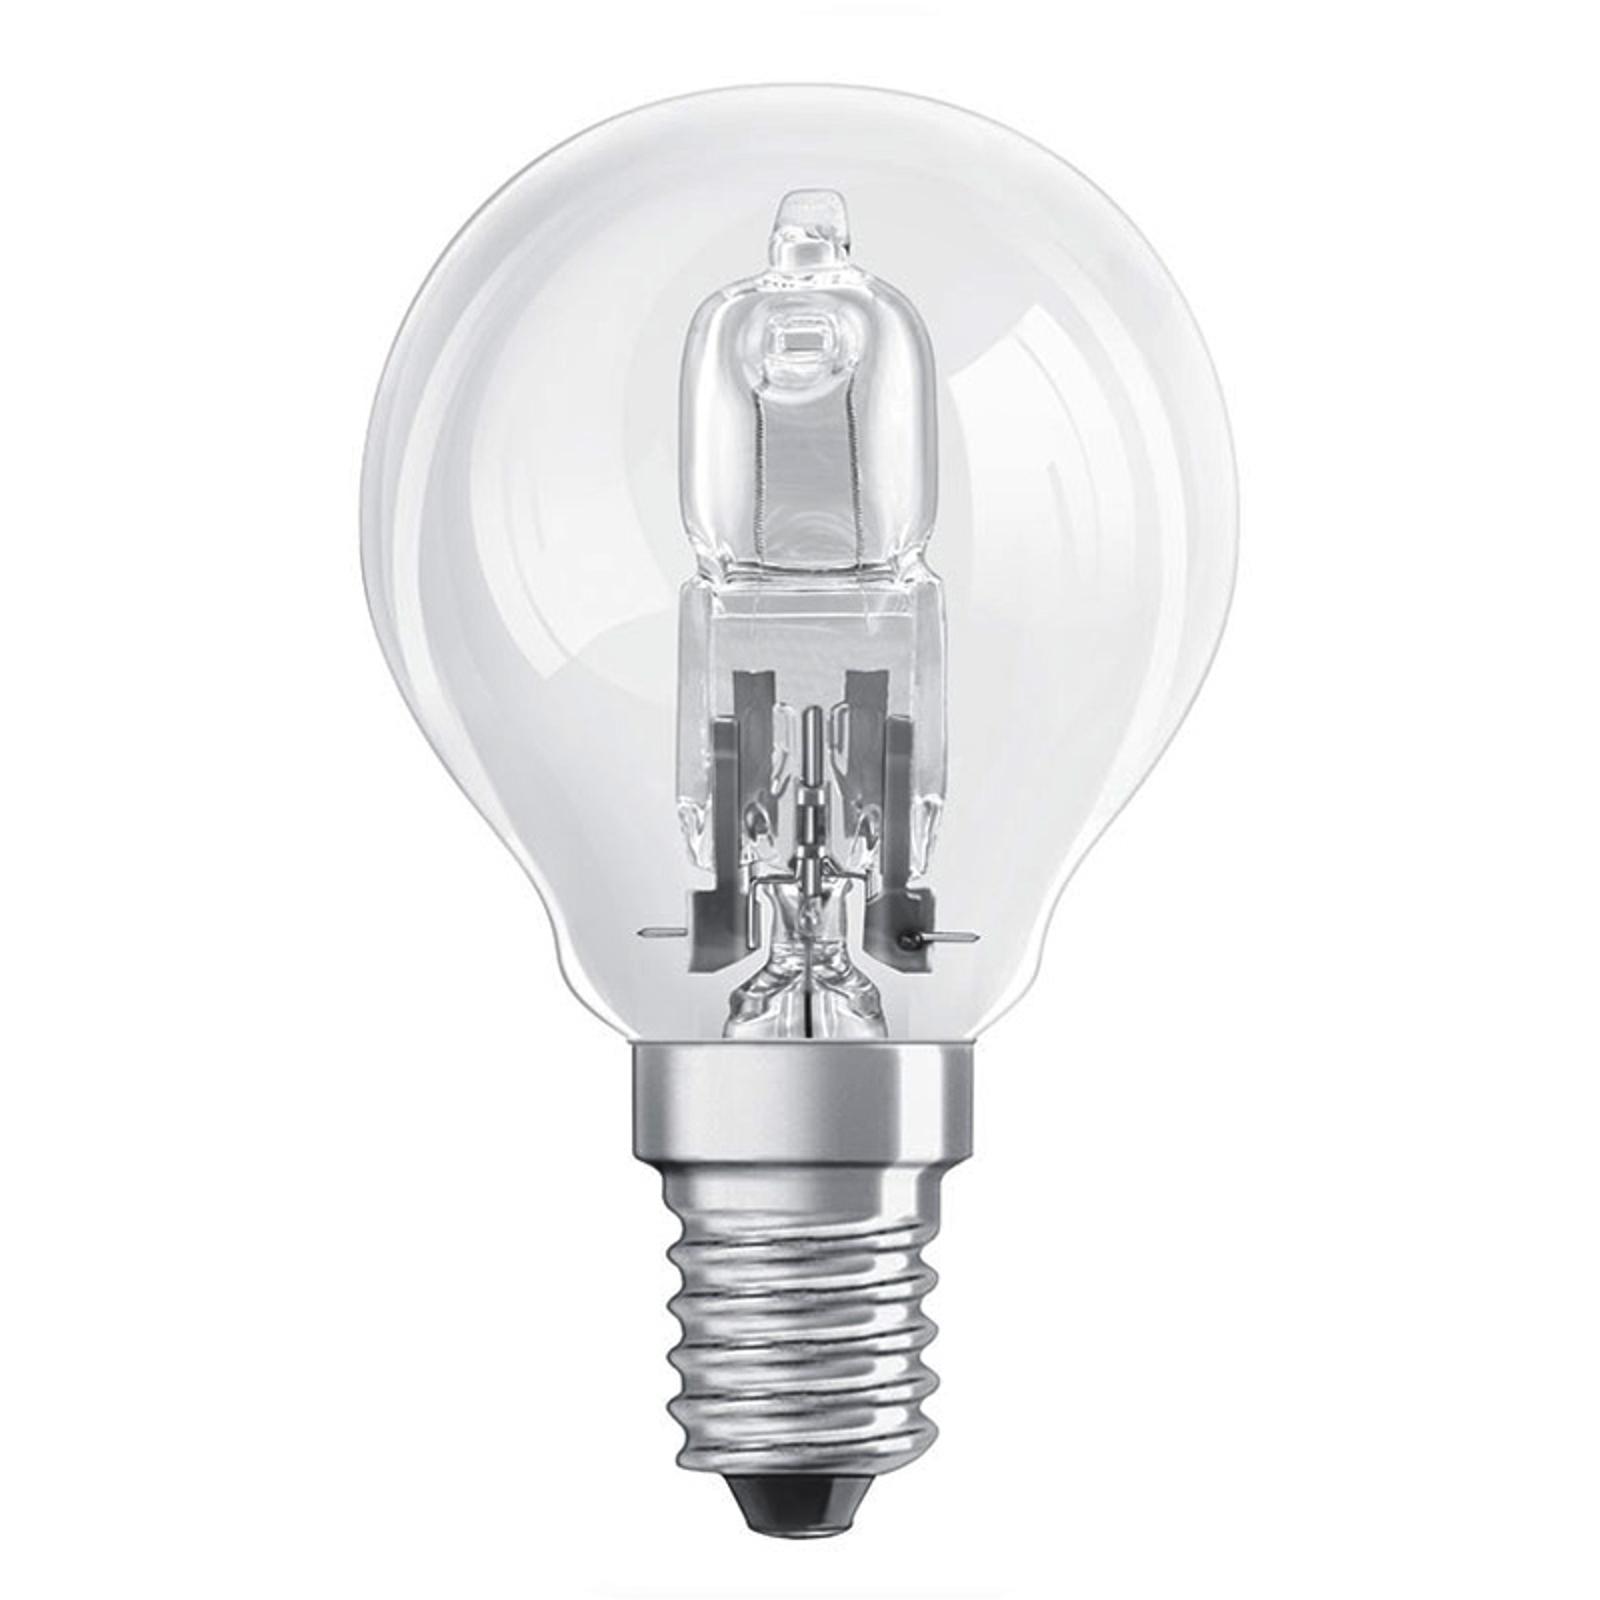 E14 tear bulb Halogen CLASSIC P_7260215_1